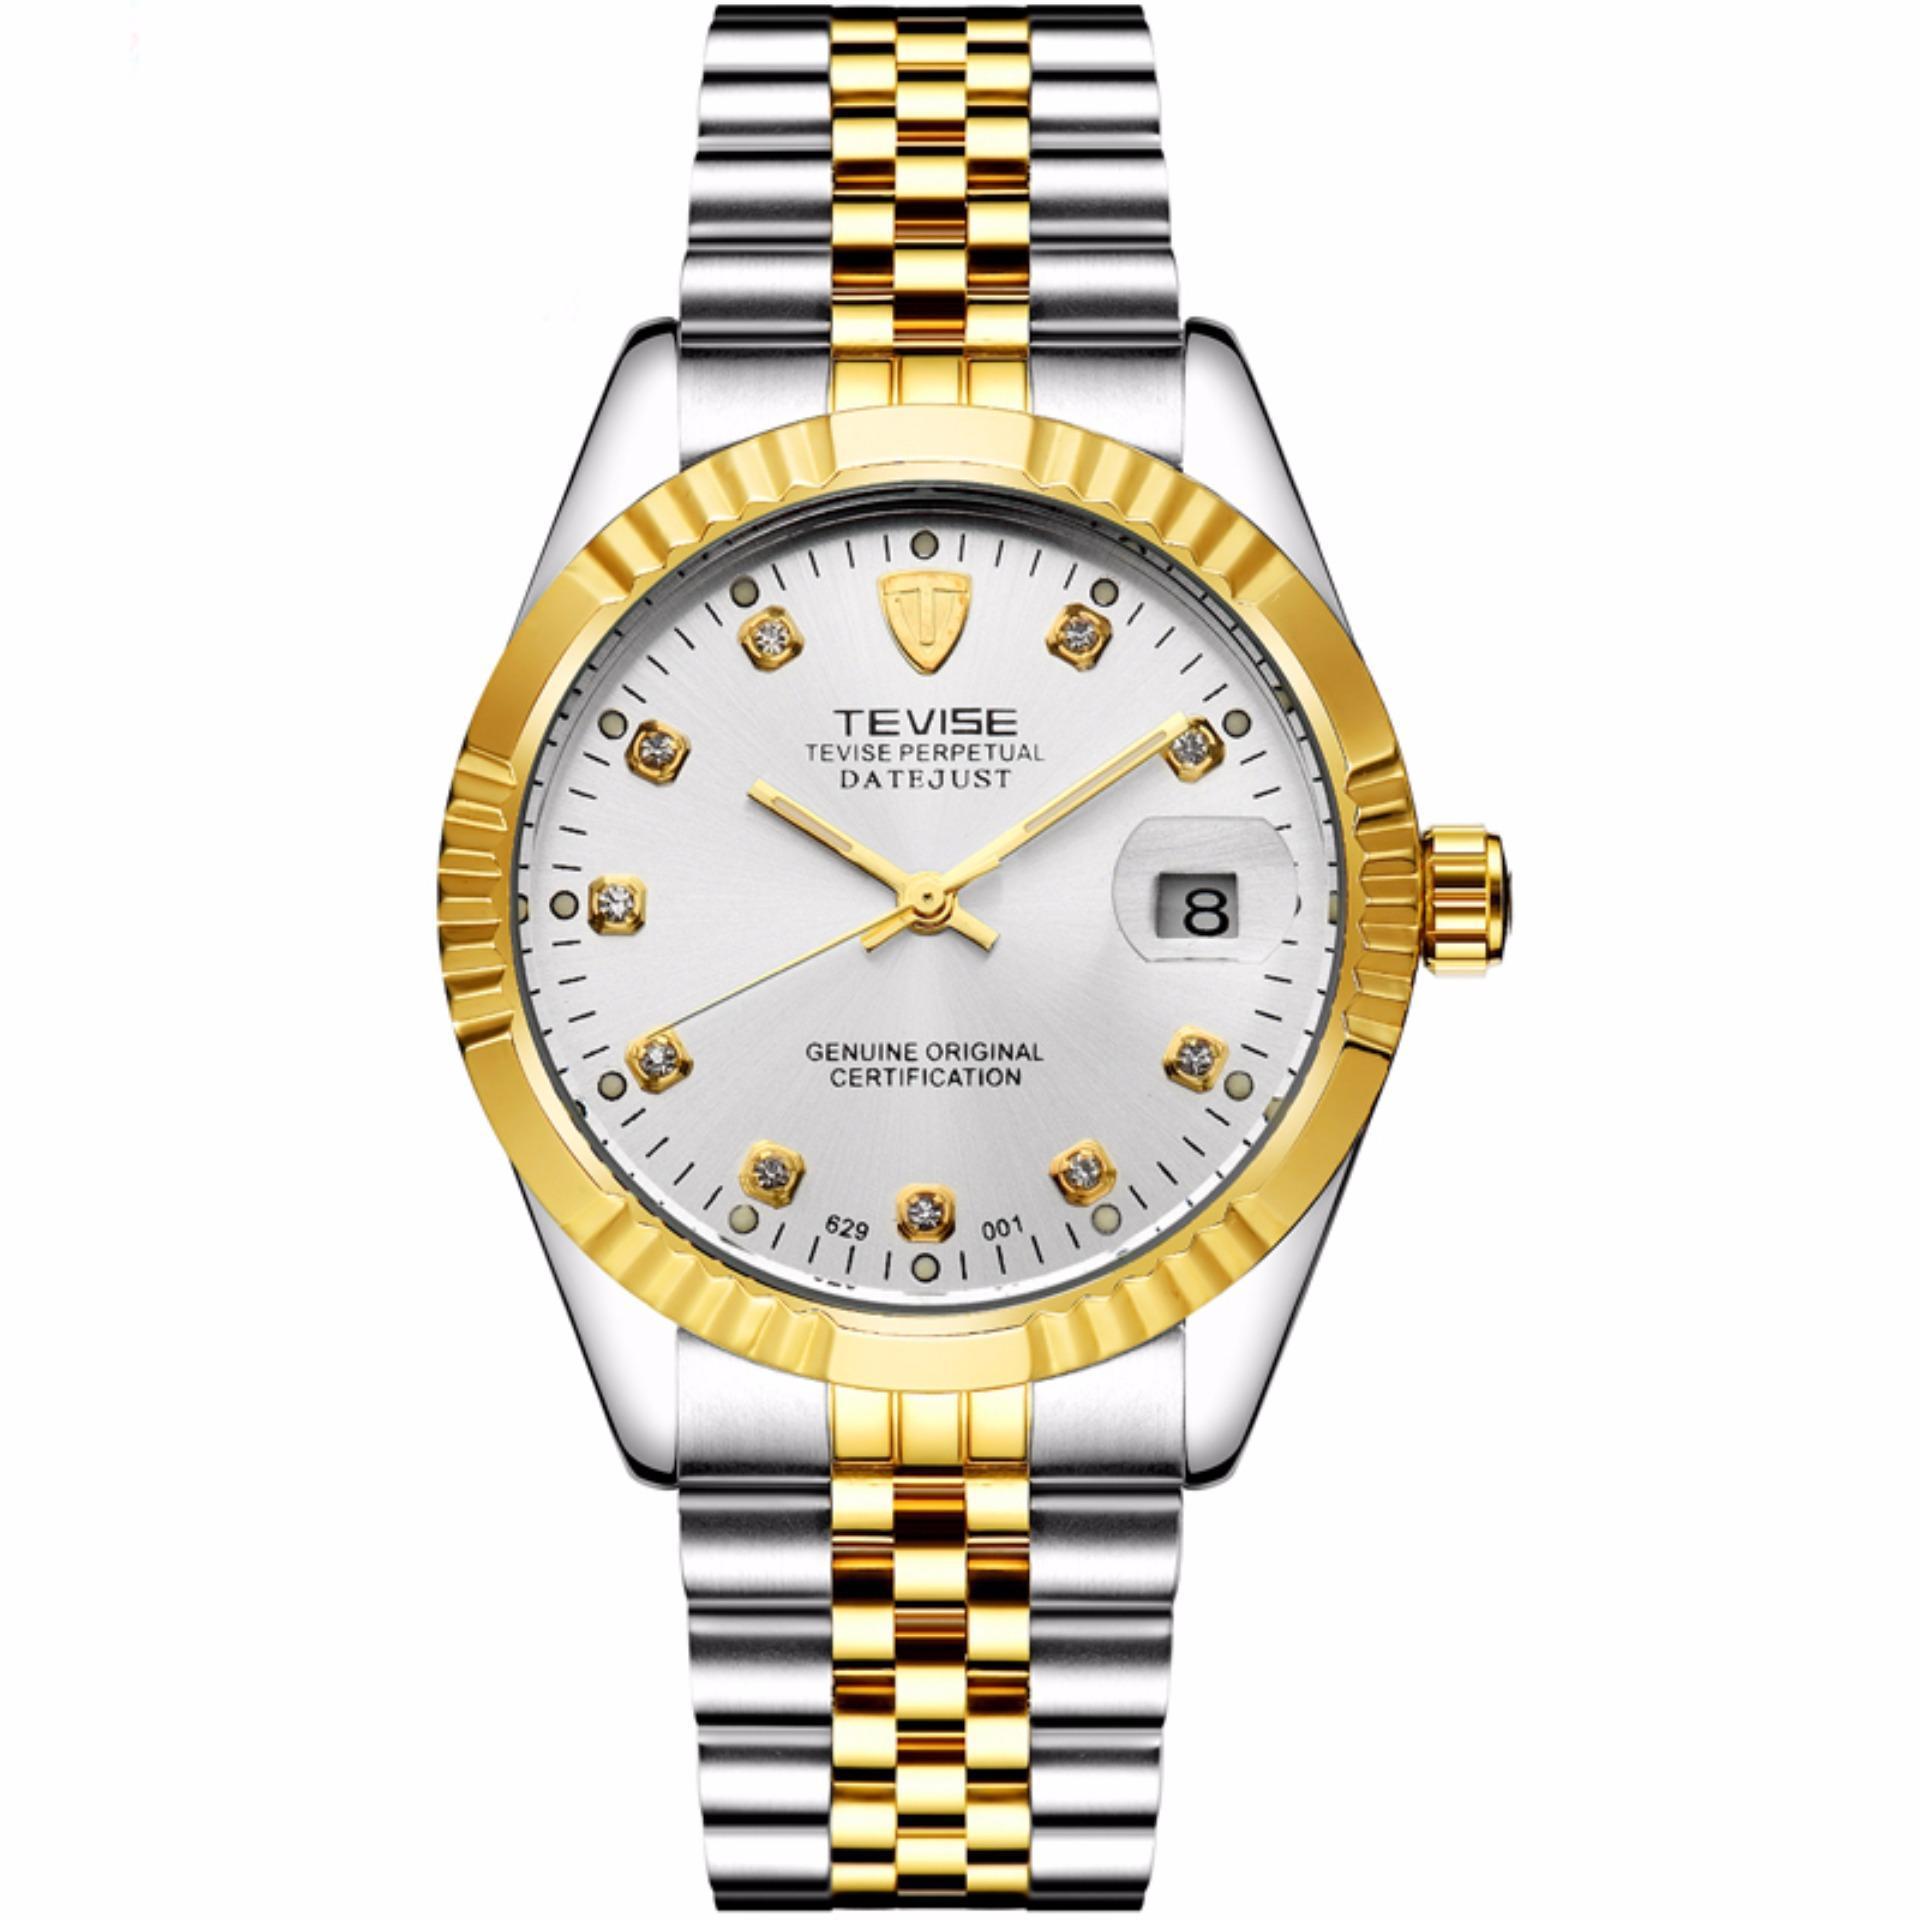 Top Brand Luxury Waterproof Automatic Watch Men Mechanical Watch Luminous Sport Casual Watch Relogio Automatico Masculino TEVISE(White) - intl